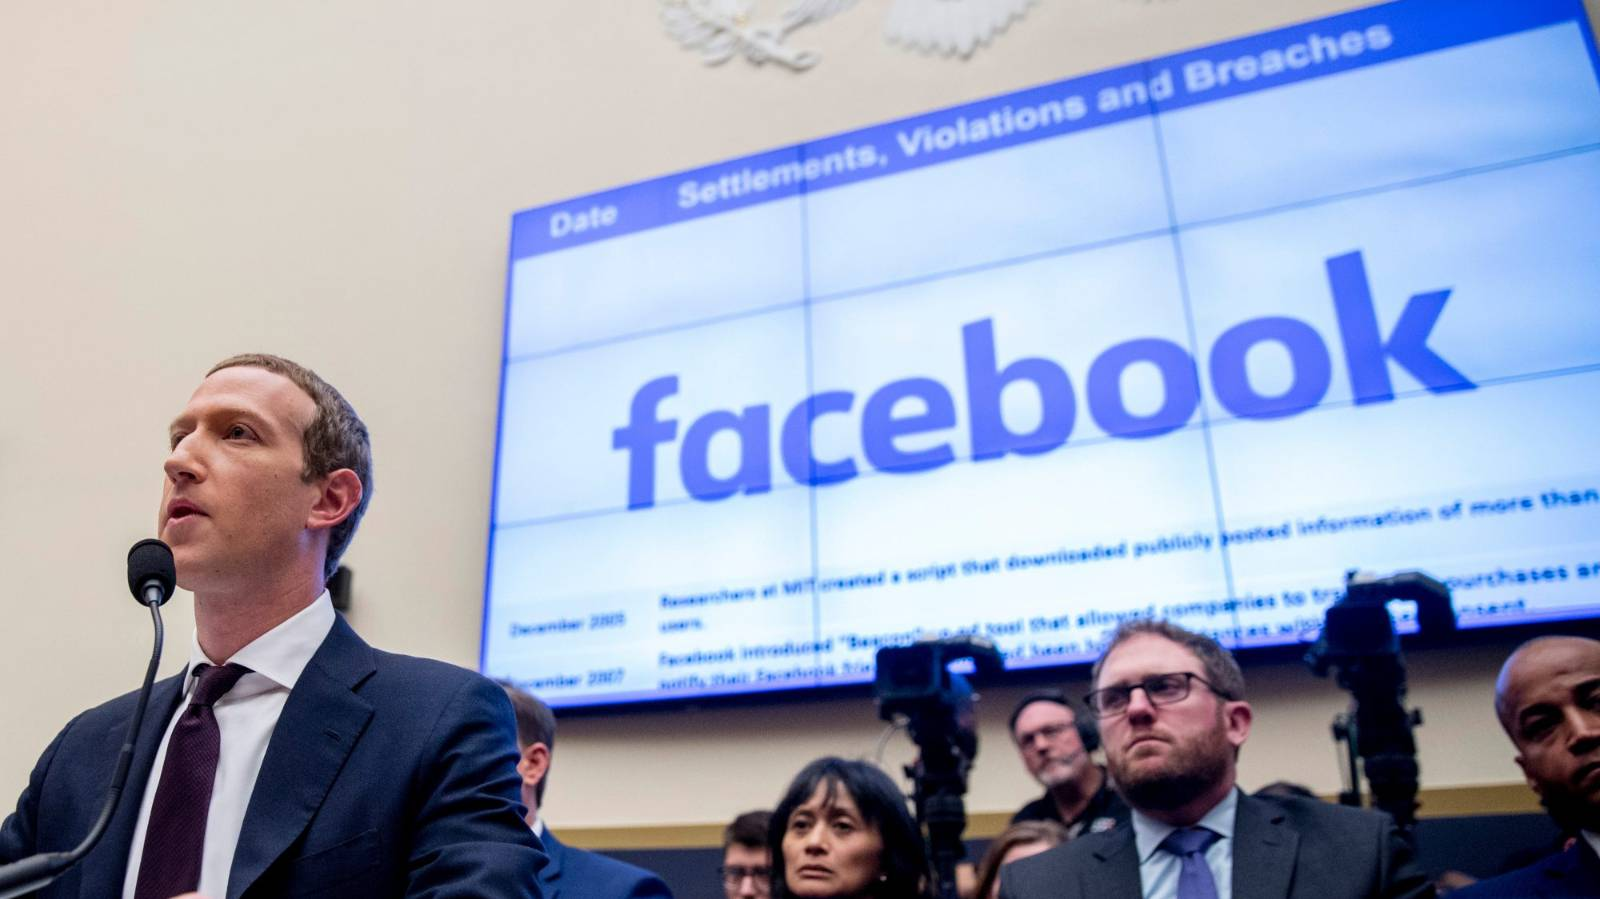 Facebook's threat to Australian news should not be forgotten